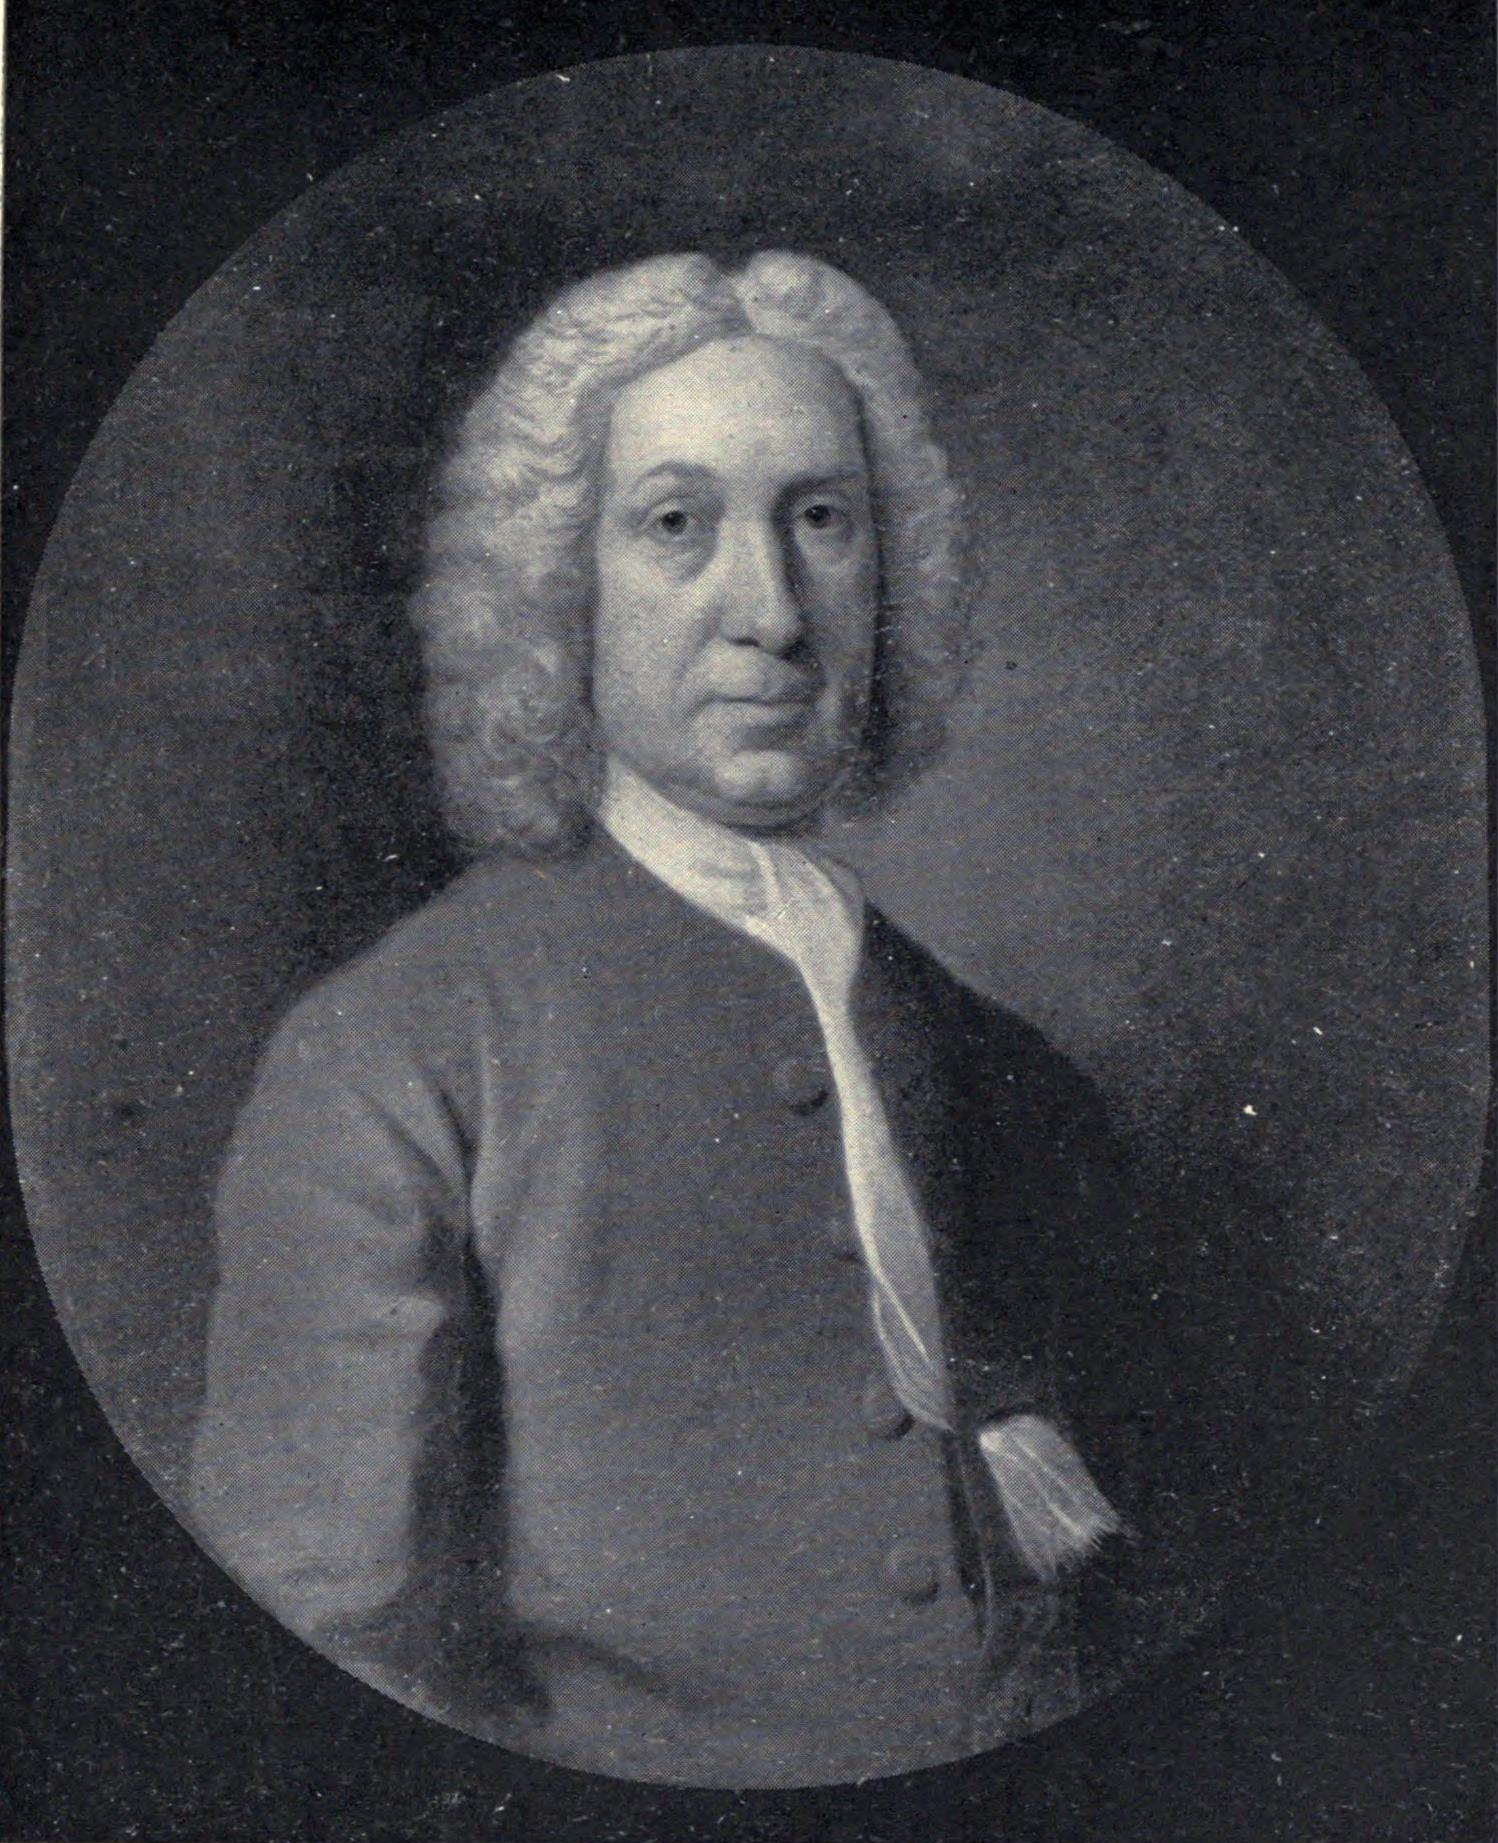 Ruddiman, 1749